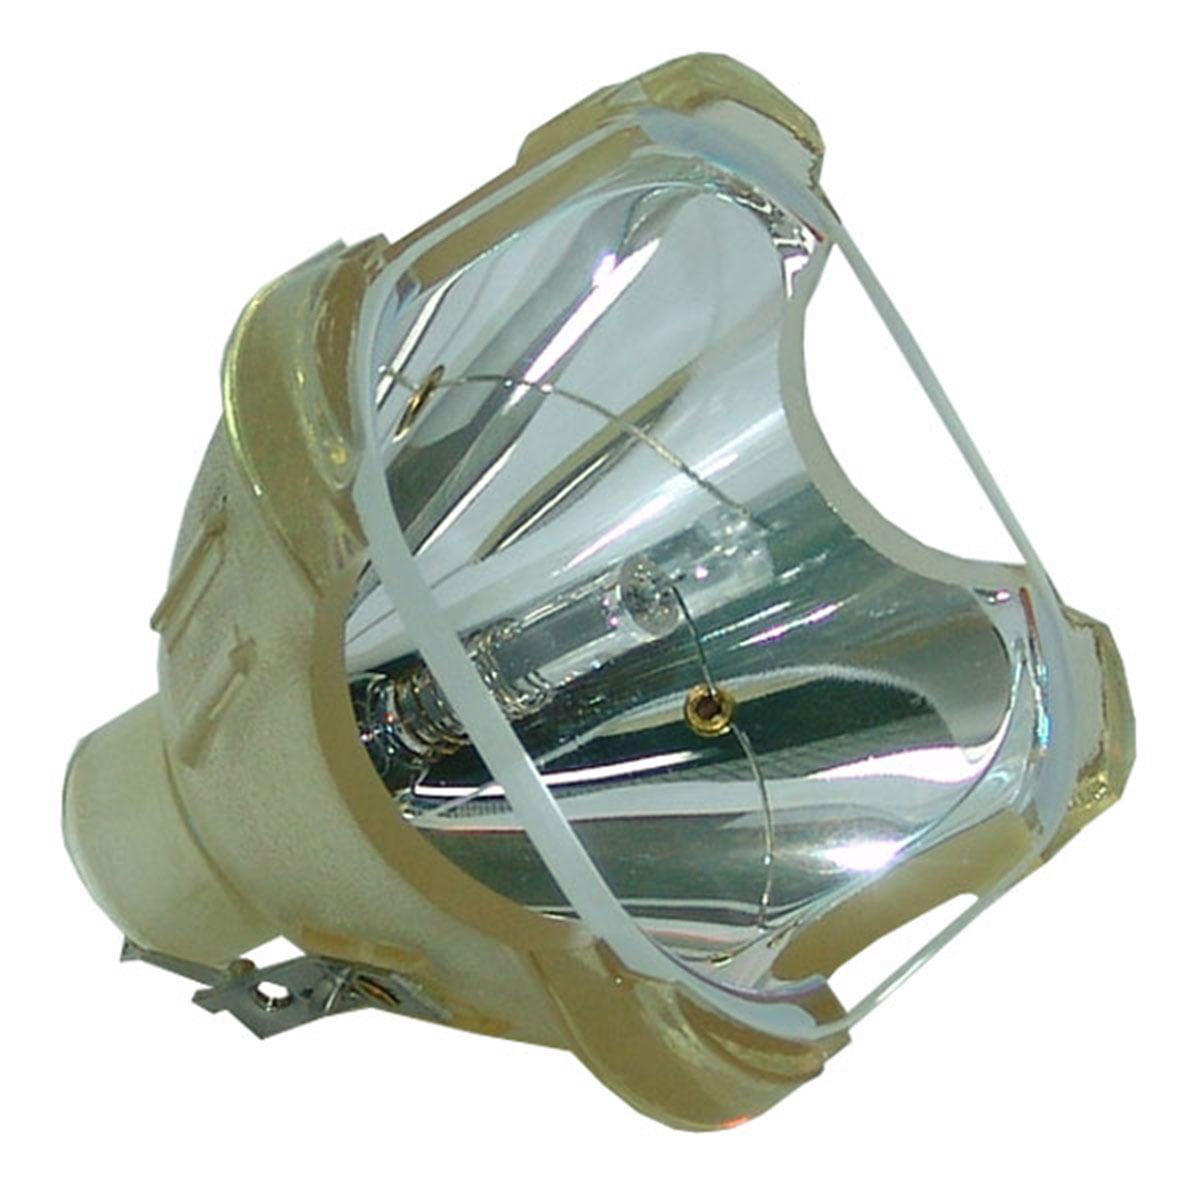 Lutema Platinum for Epson PowerLite 500 Projector Lamp (Original Philips Bulb) - image 3 of 5